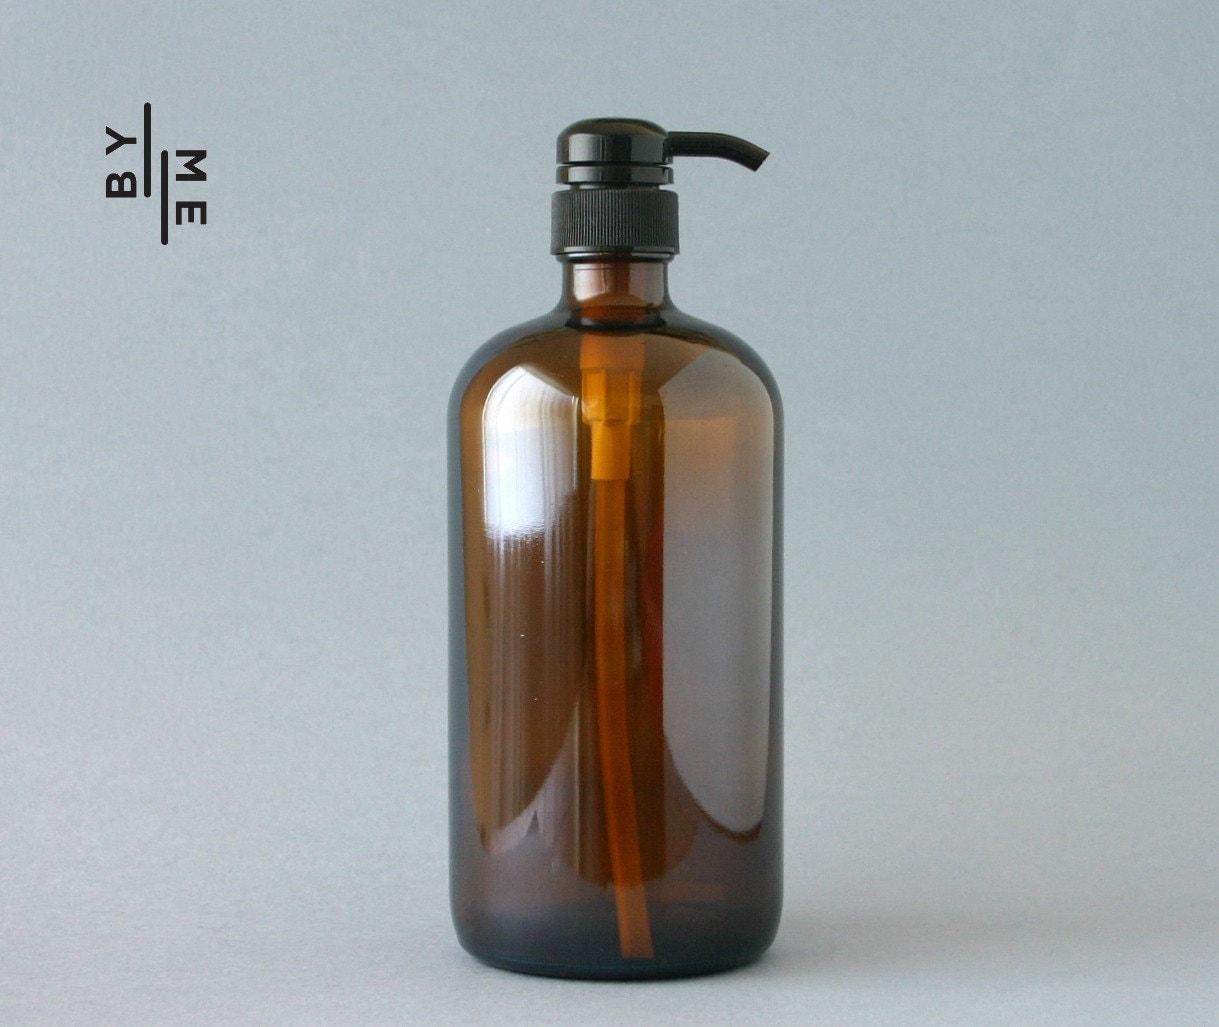 1 litre Amber Glass Bottle Soap Dispenser Pump with chalkboard